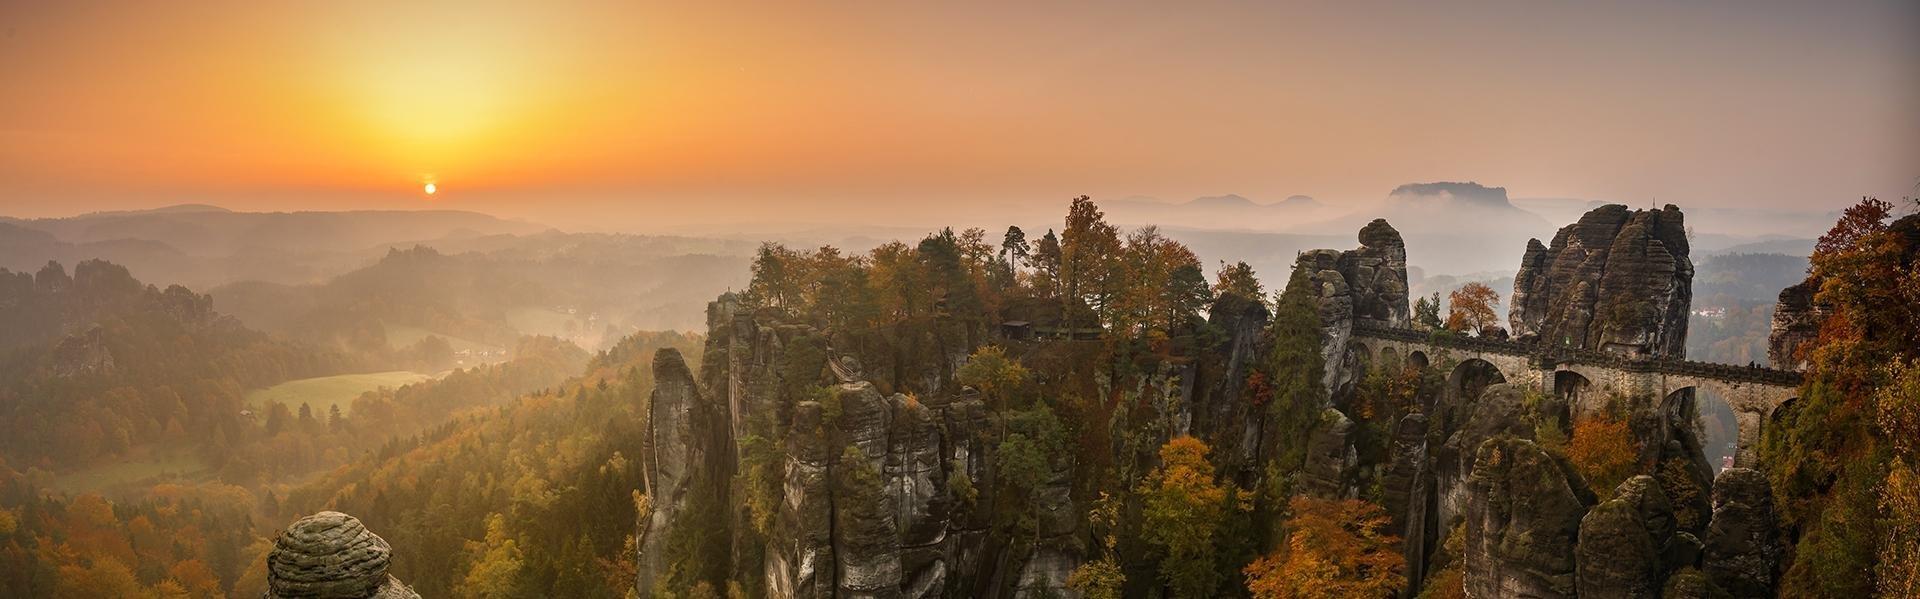 De Bastei in Saksen, Duitsland